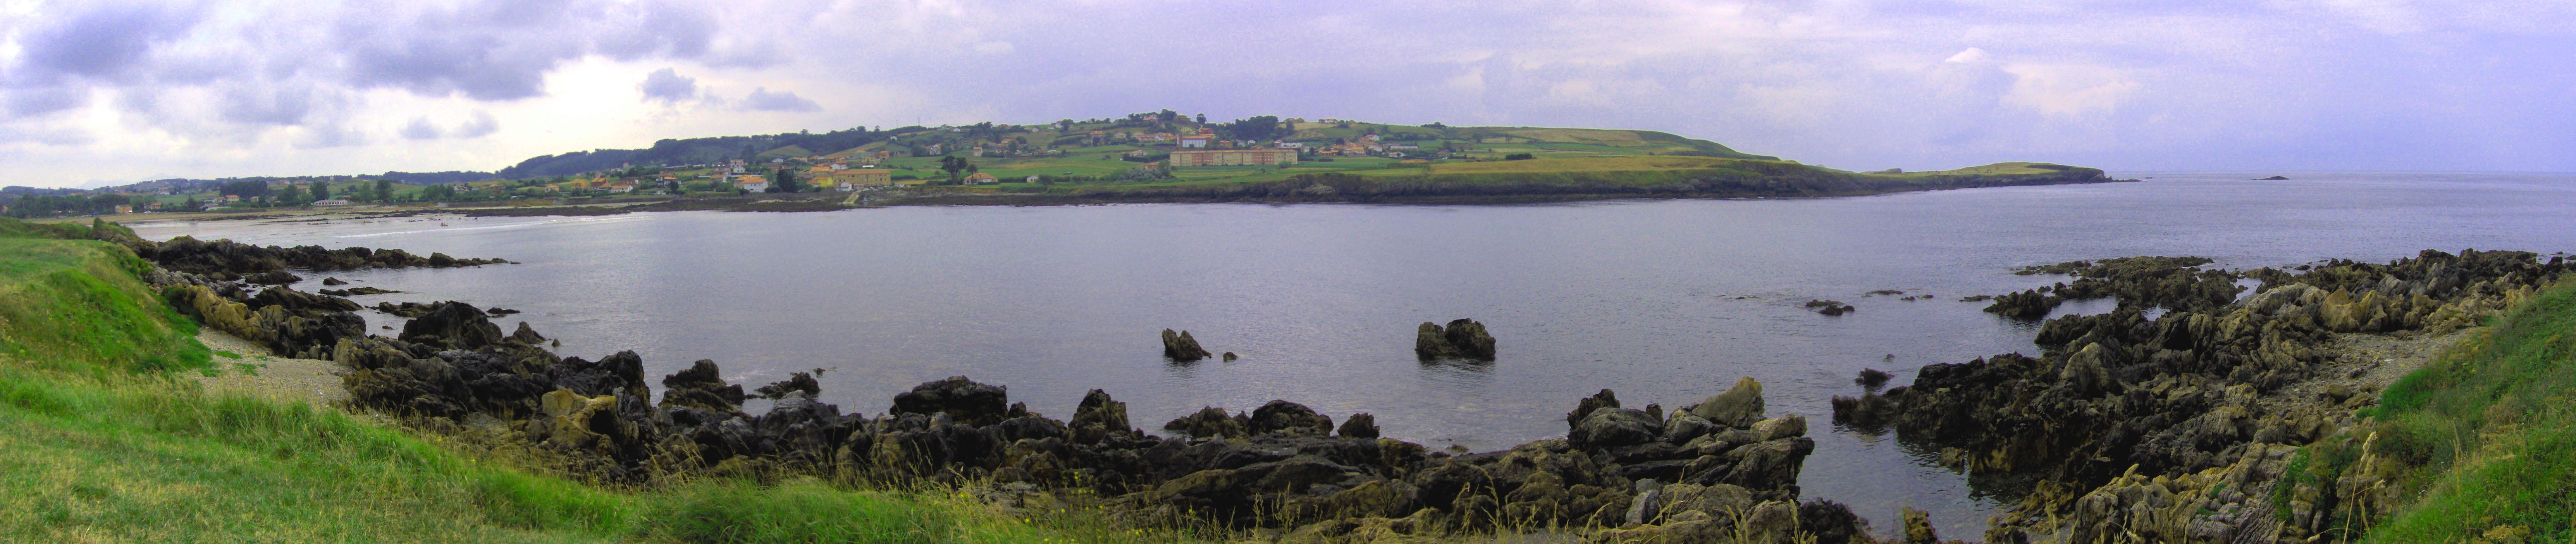 Foto playa Bañugues. Panorámica de Bañugues